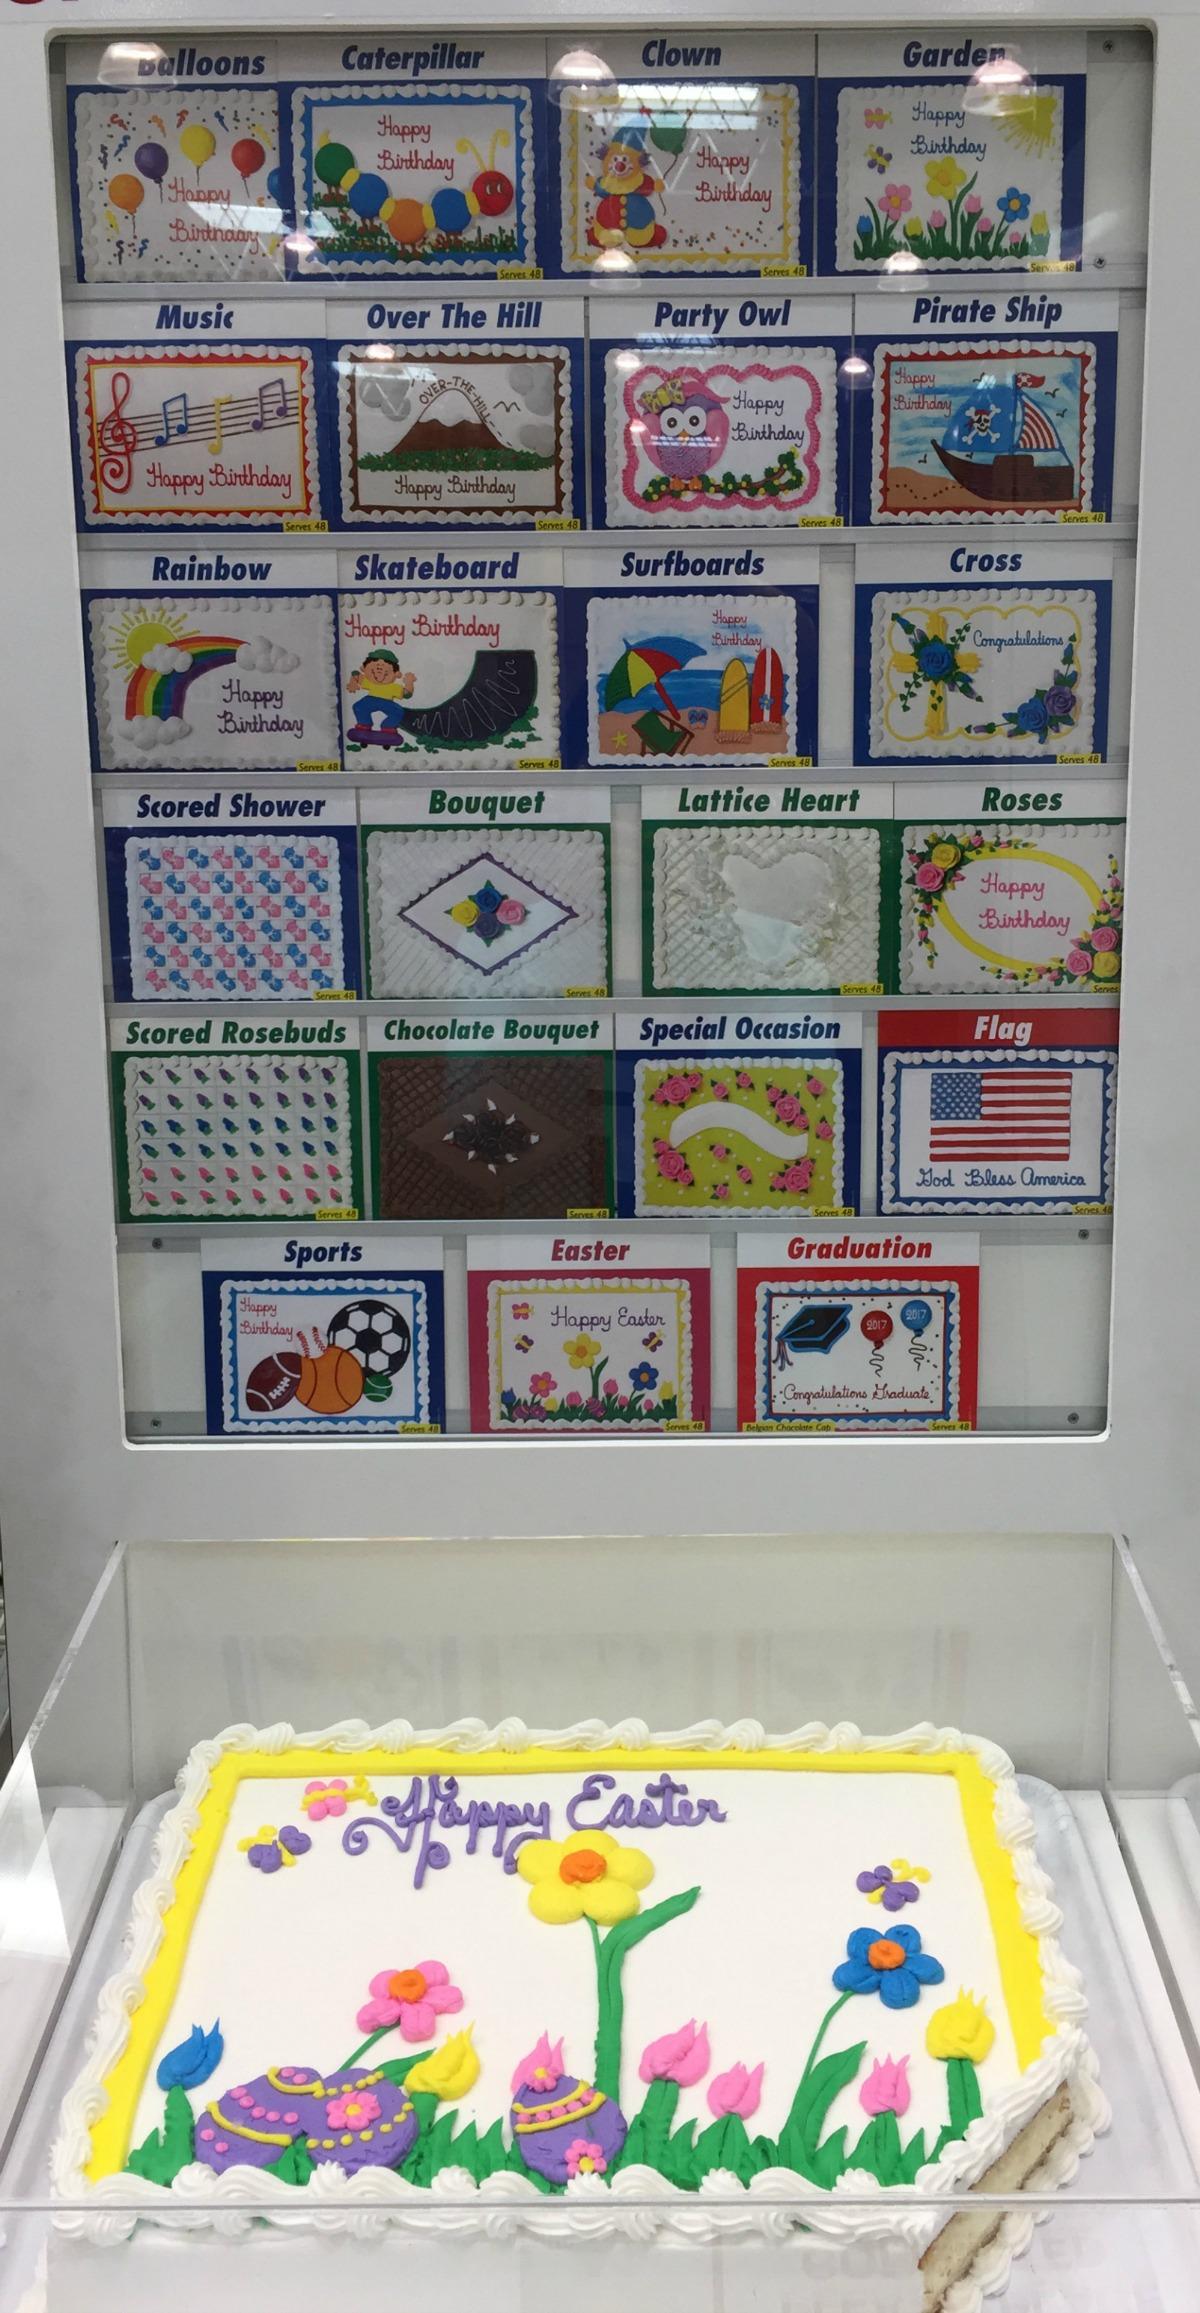 Costco Bakery Birthday Cake Designs